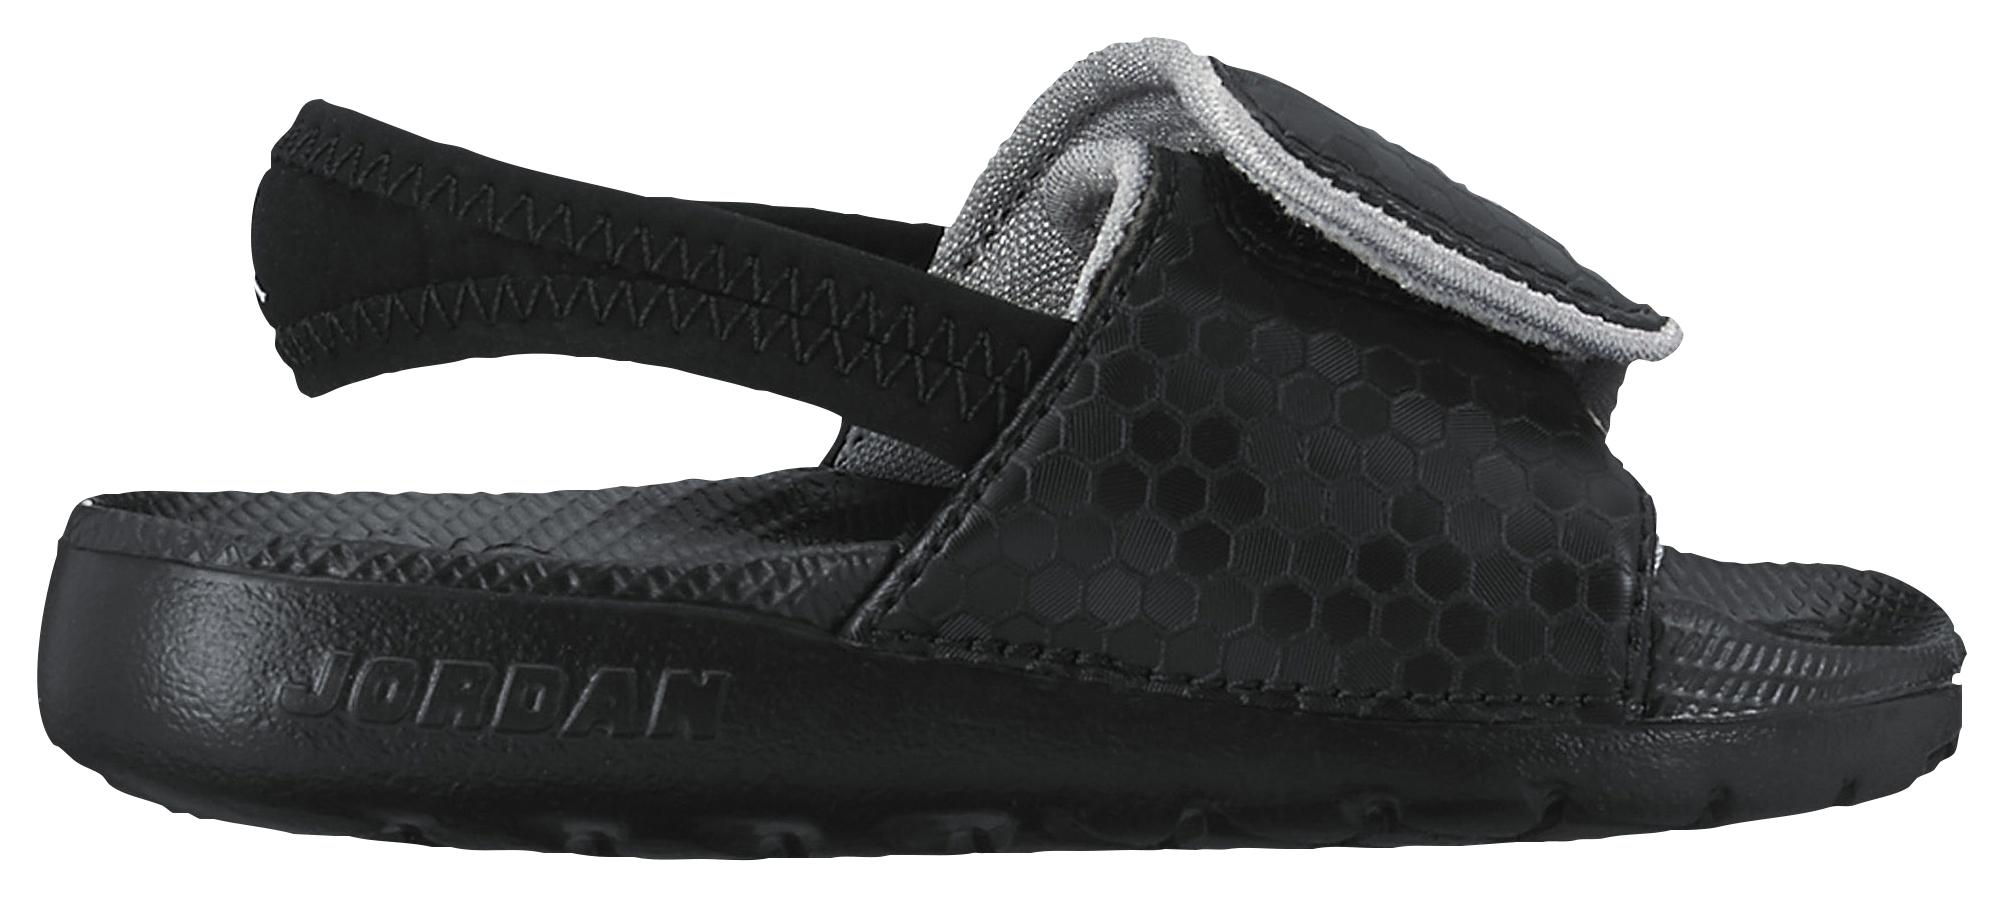 48cc4edf413 Nike Jordan Hydro Sandals Kids | Model Aviation